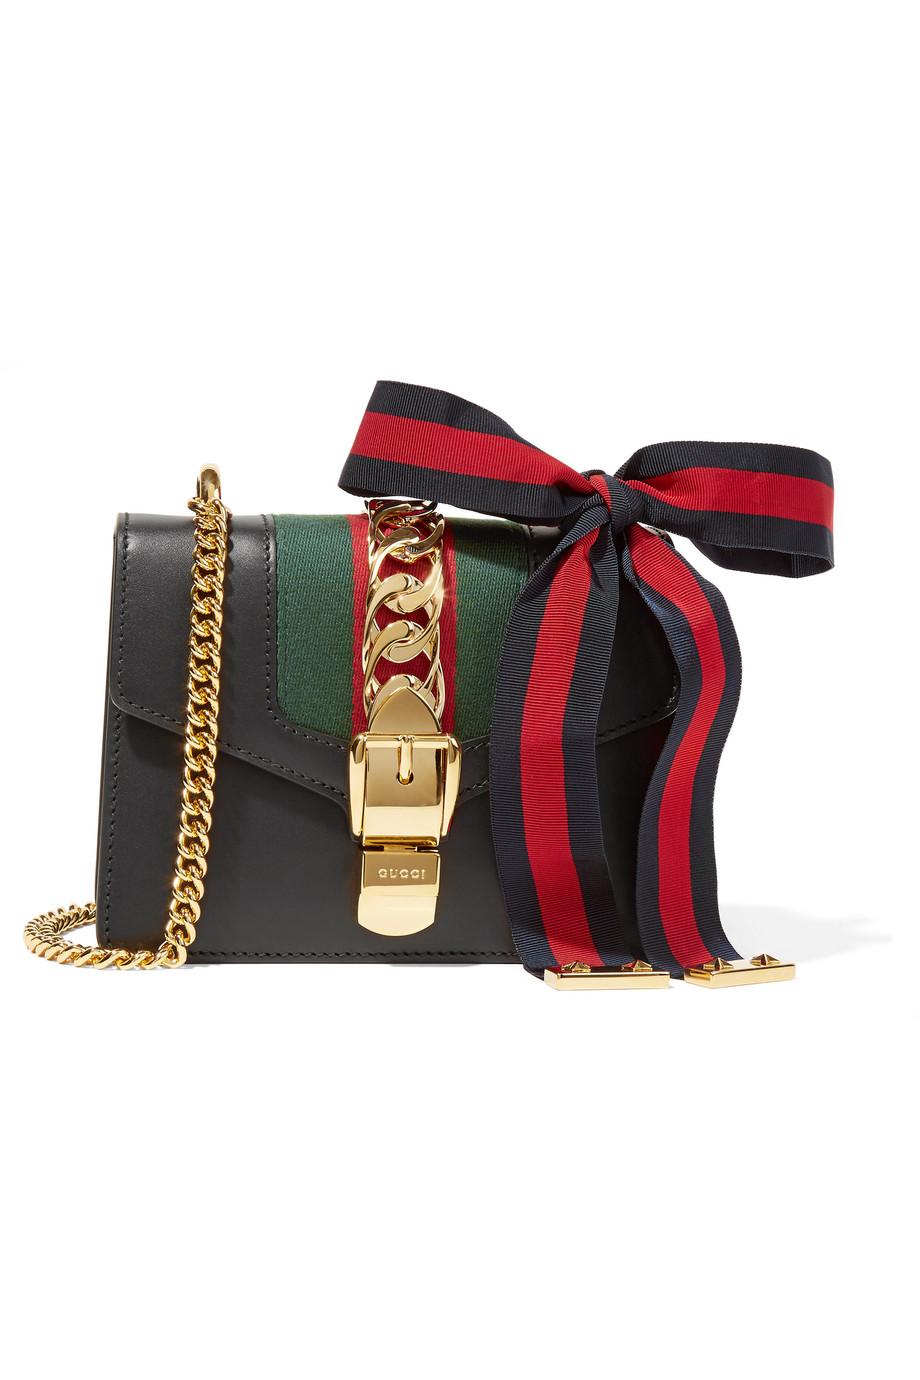 Gucci Sylvie Mini Canvas-Paneled Leather Shoulder Bag